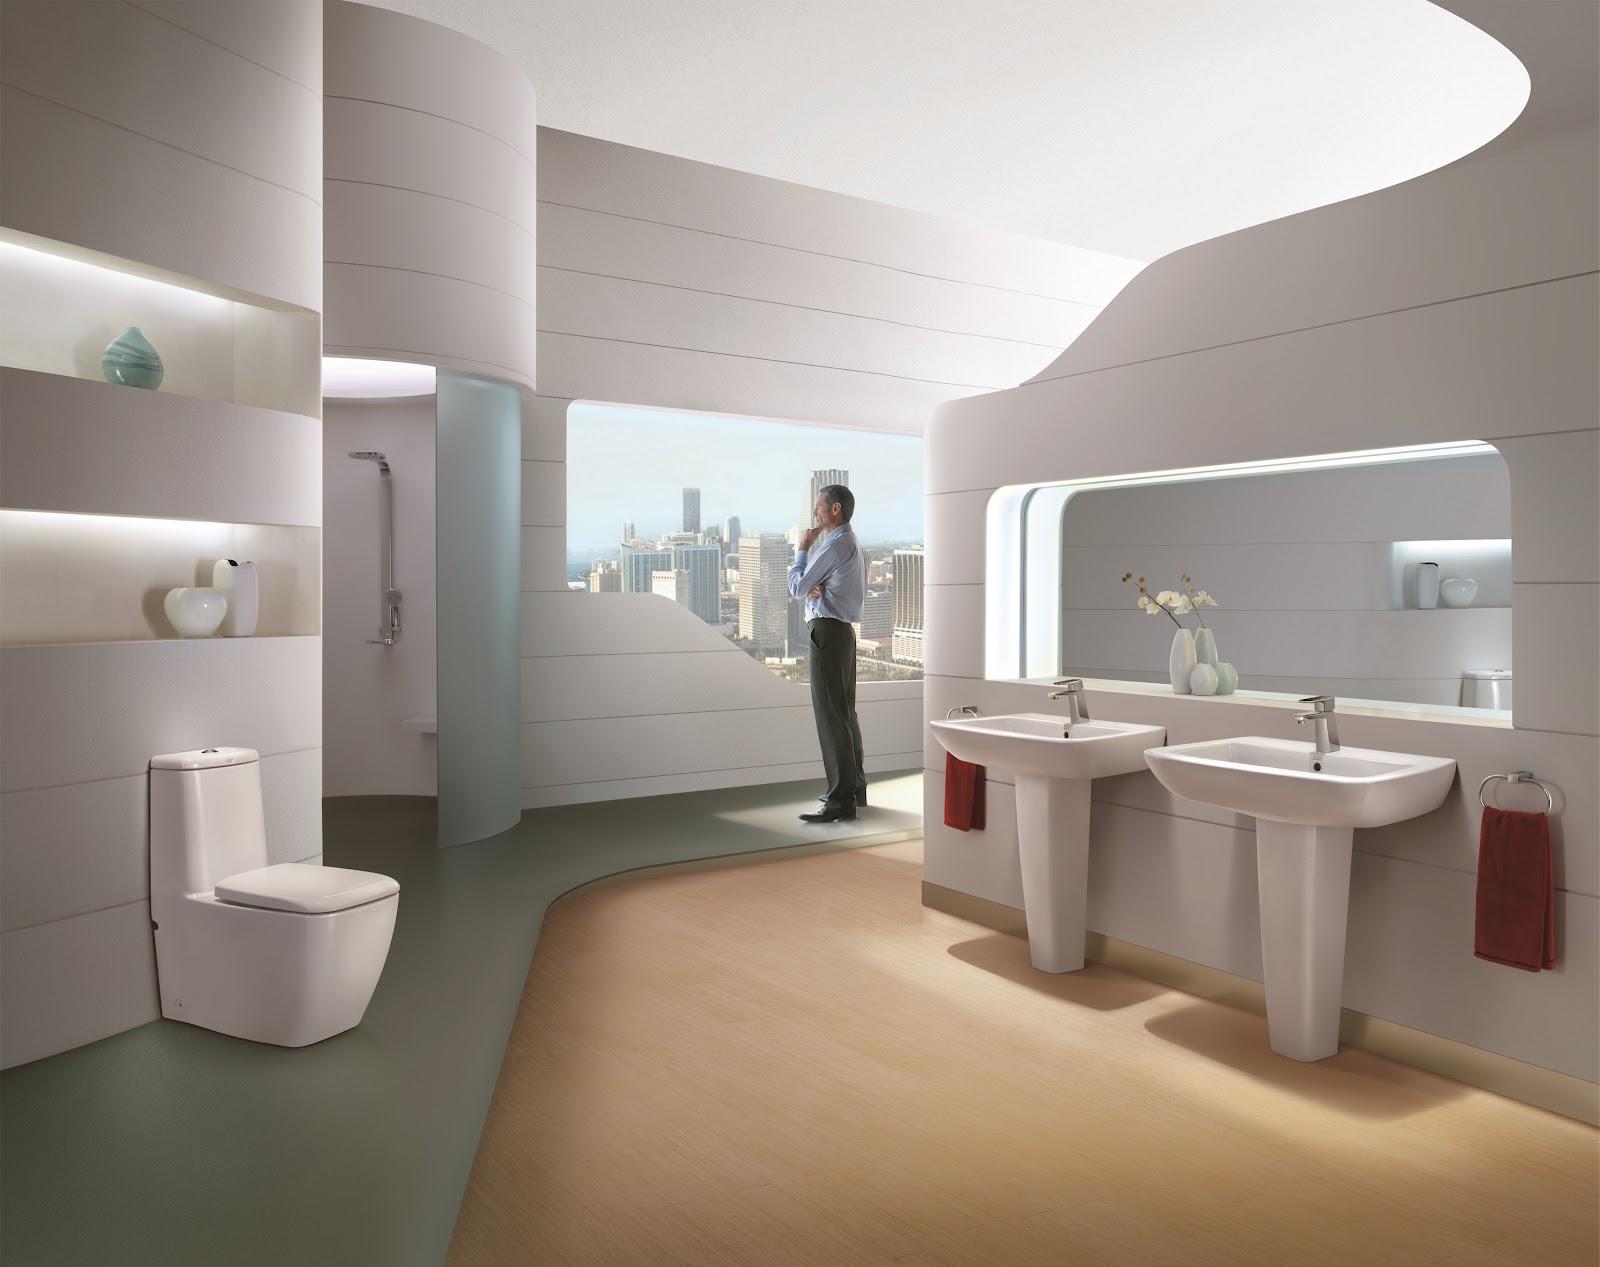 Yaniconquistadora: American Standard Launches New Luxury